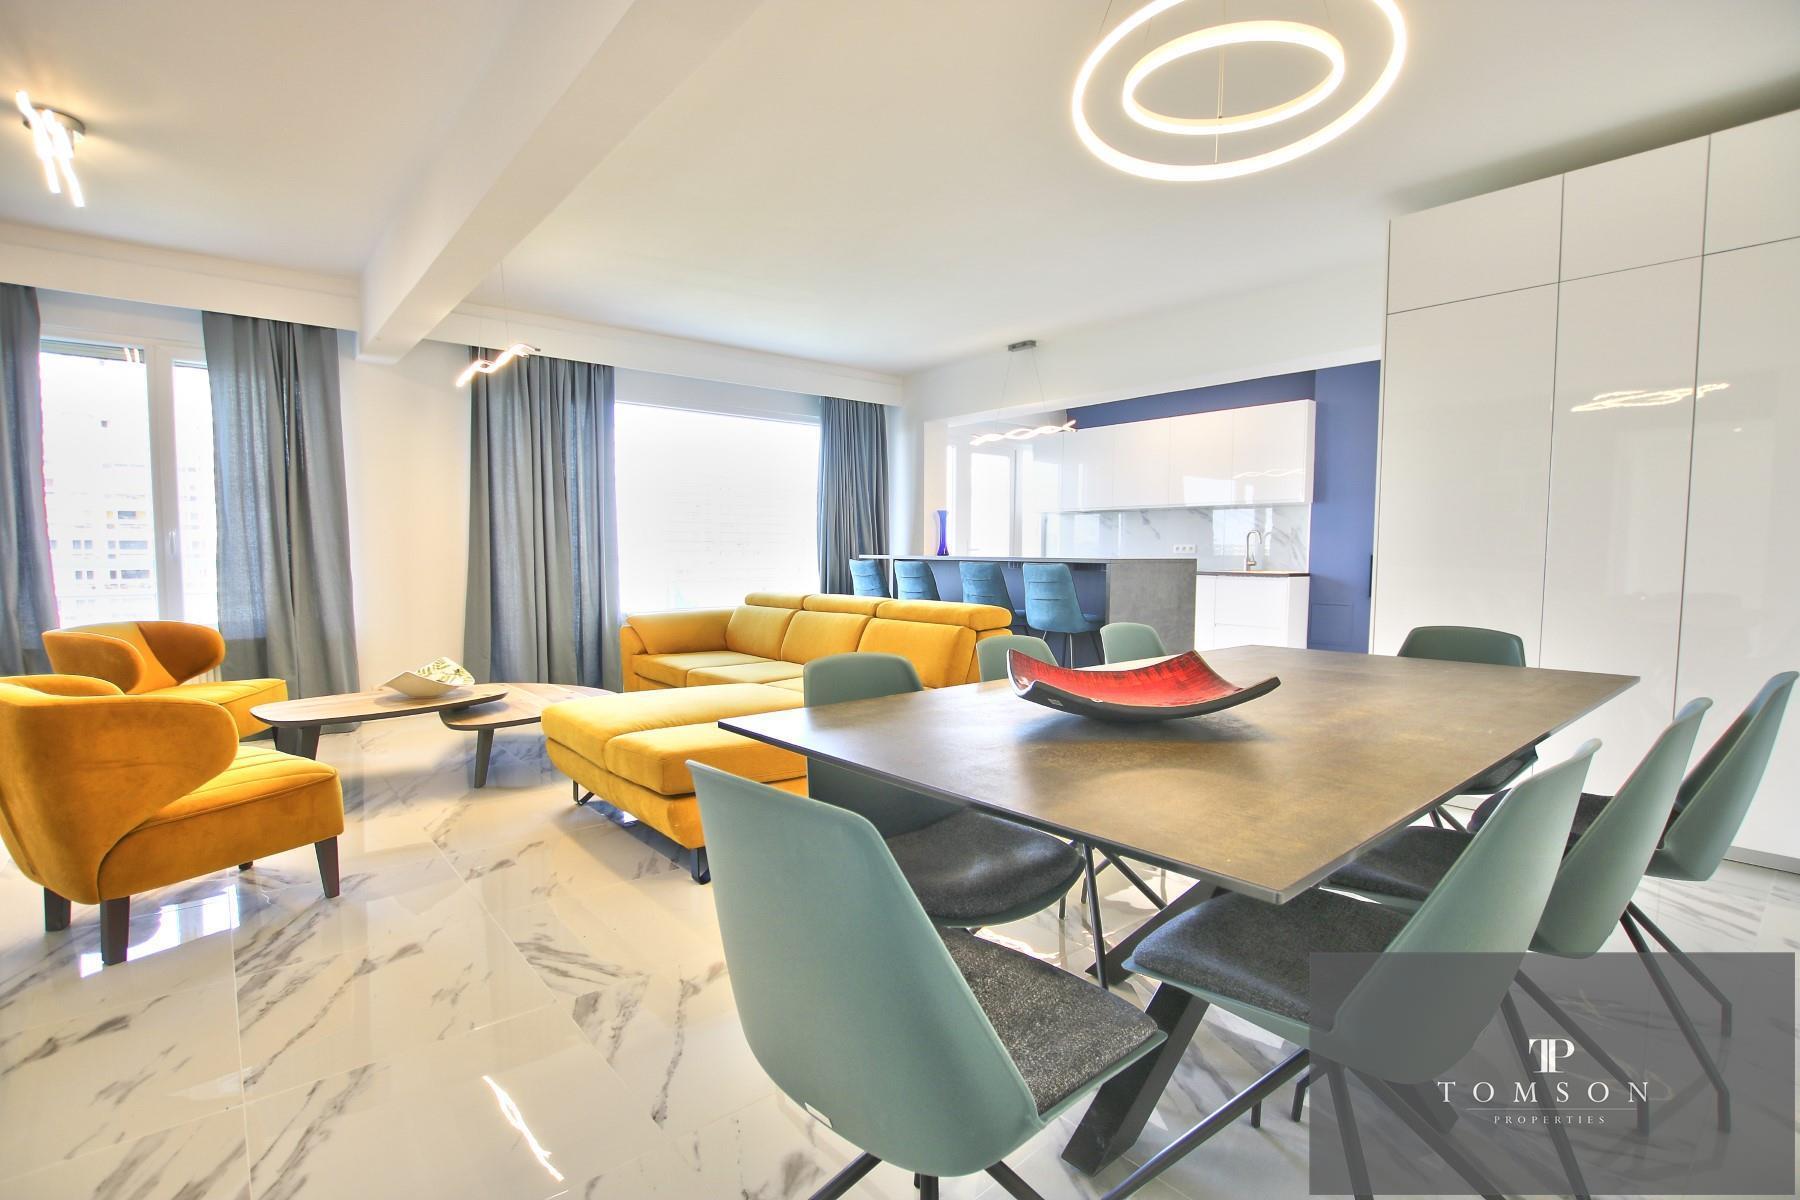 Appartement - Woluwe-Saint-Lambert - #4530510-6